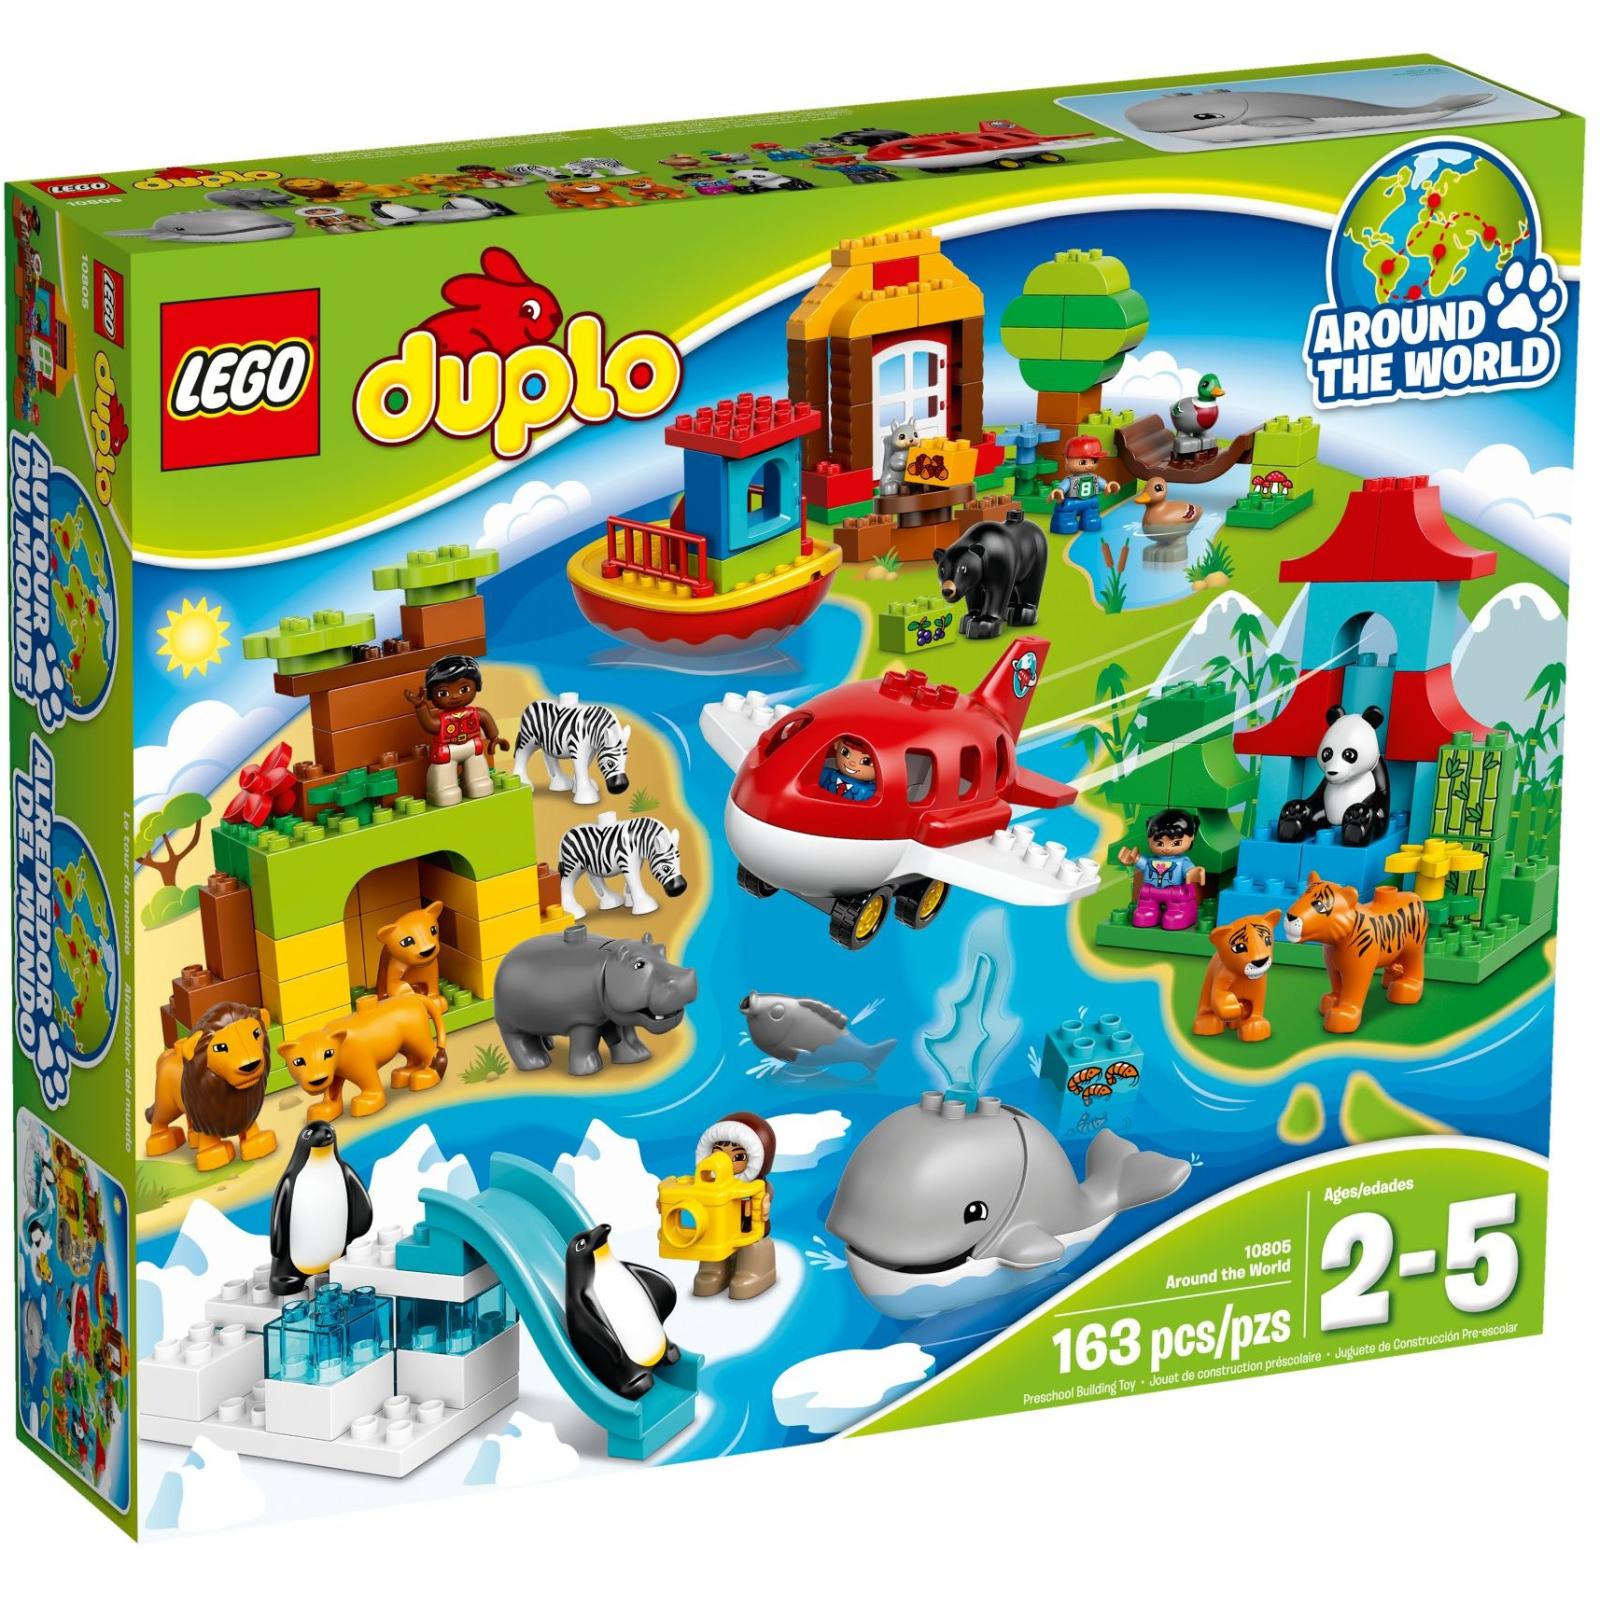 Конструктор LEGO Duplo Town Вокруг света (10805)